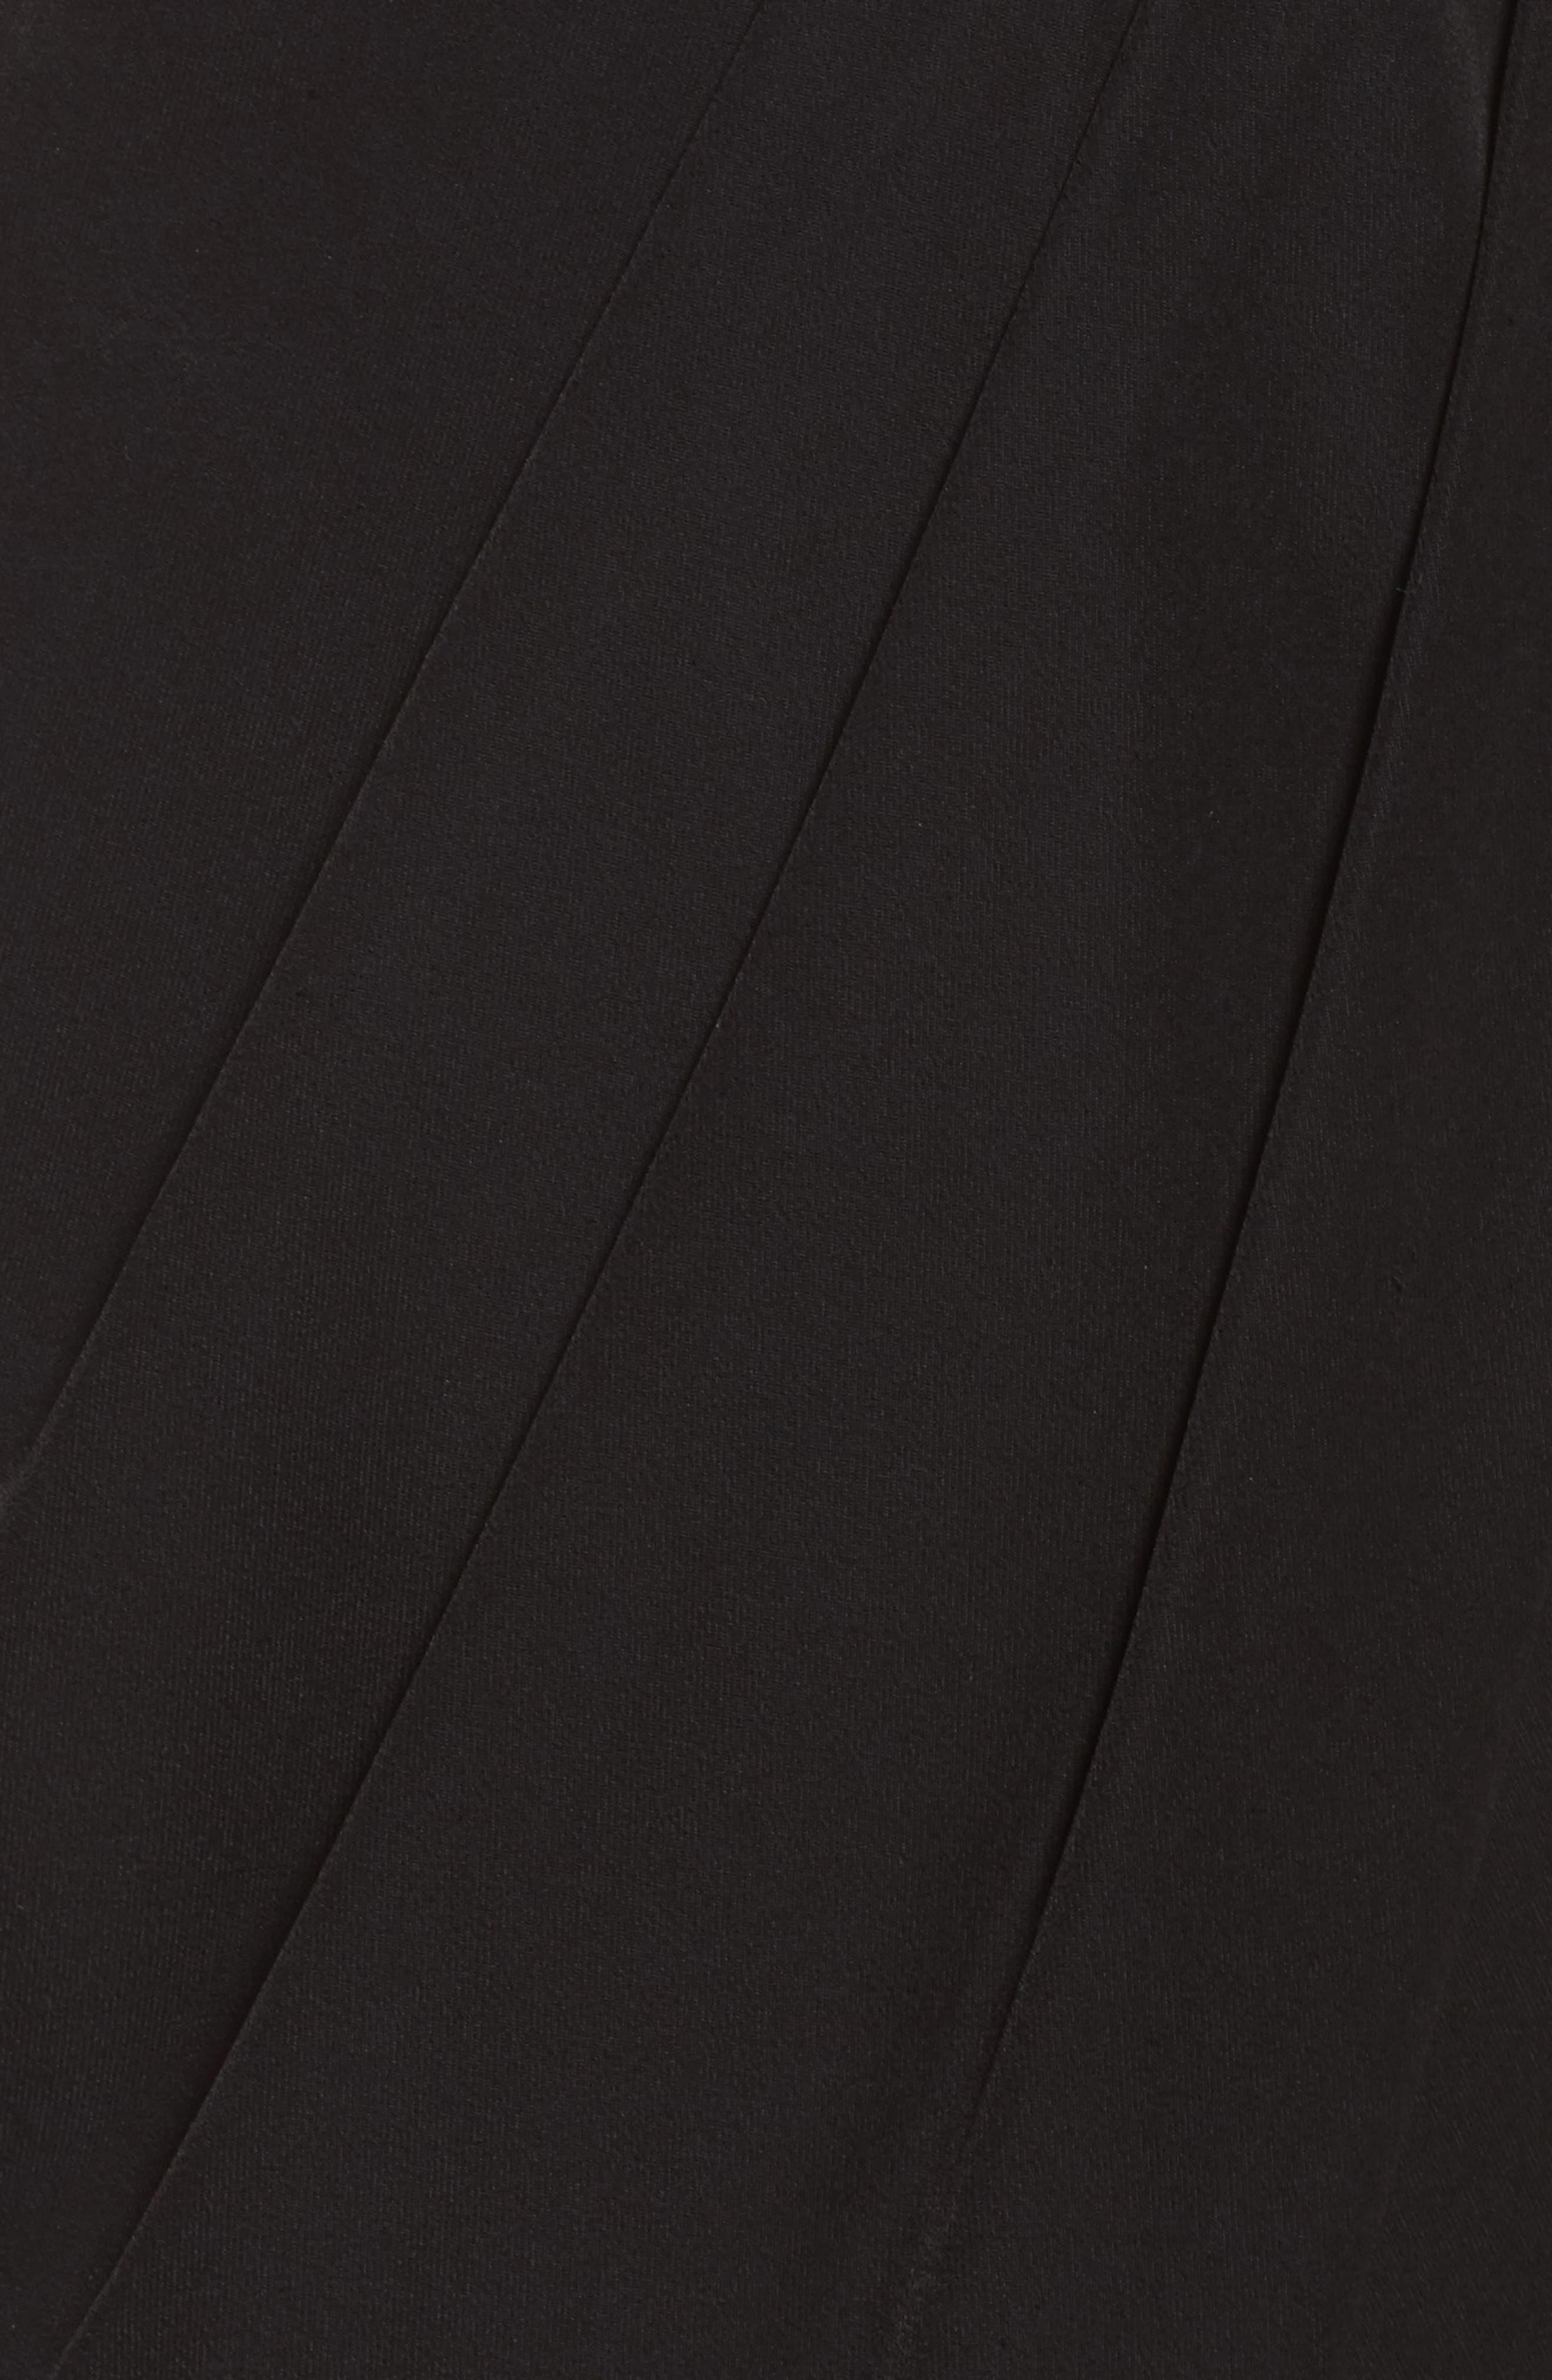 Loren Strapless Asymmetric Dress,                             Alternate thumbnail 5, color,